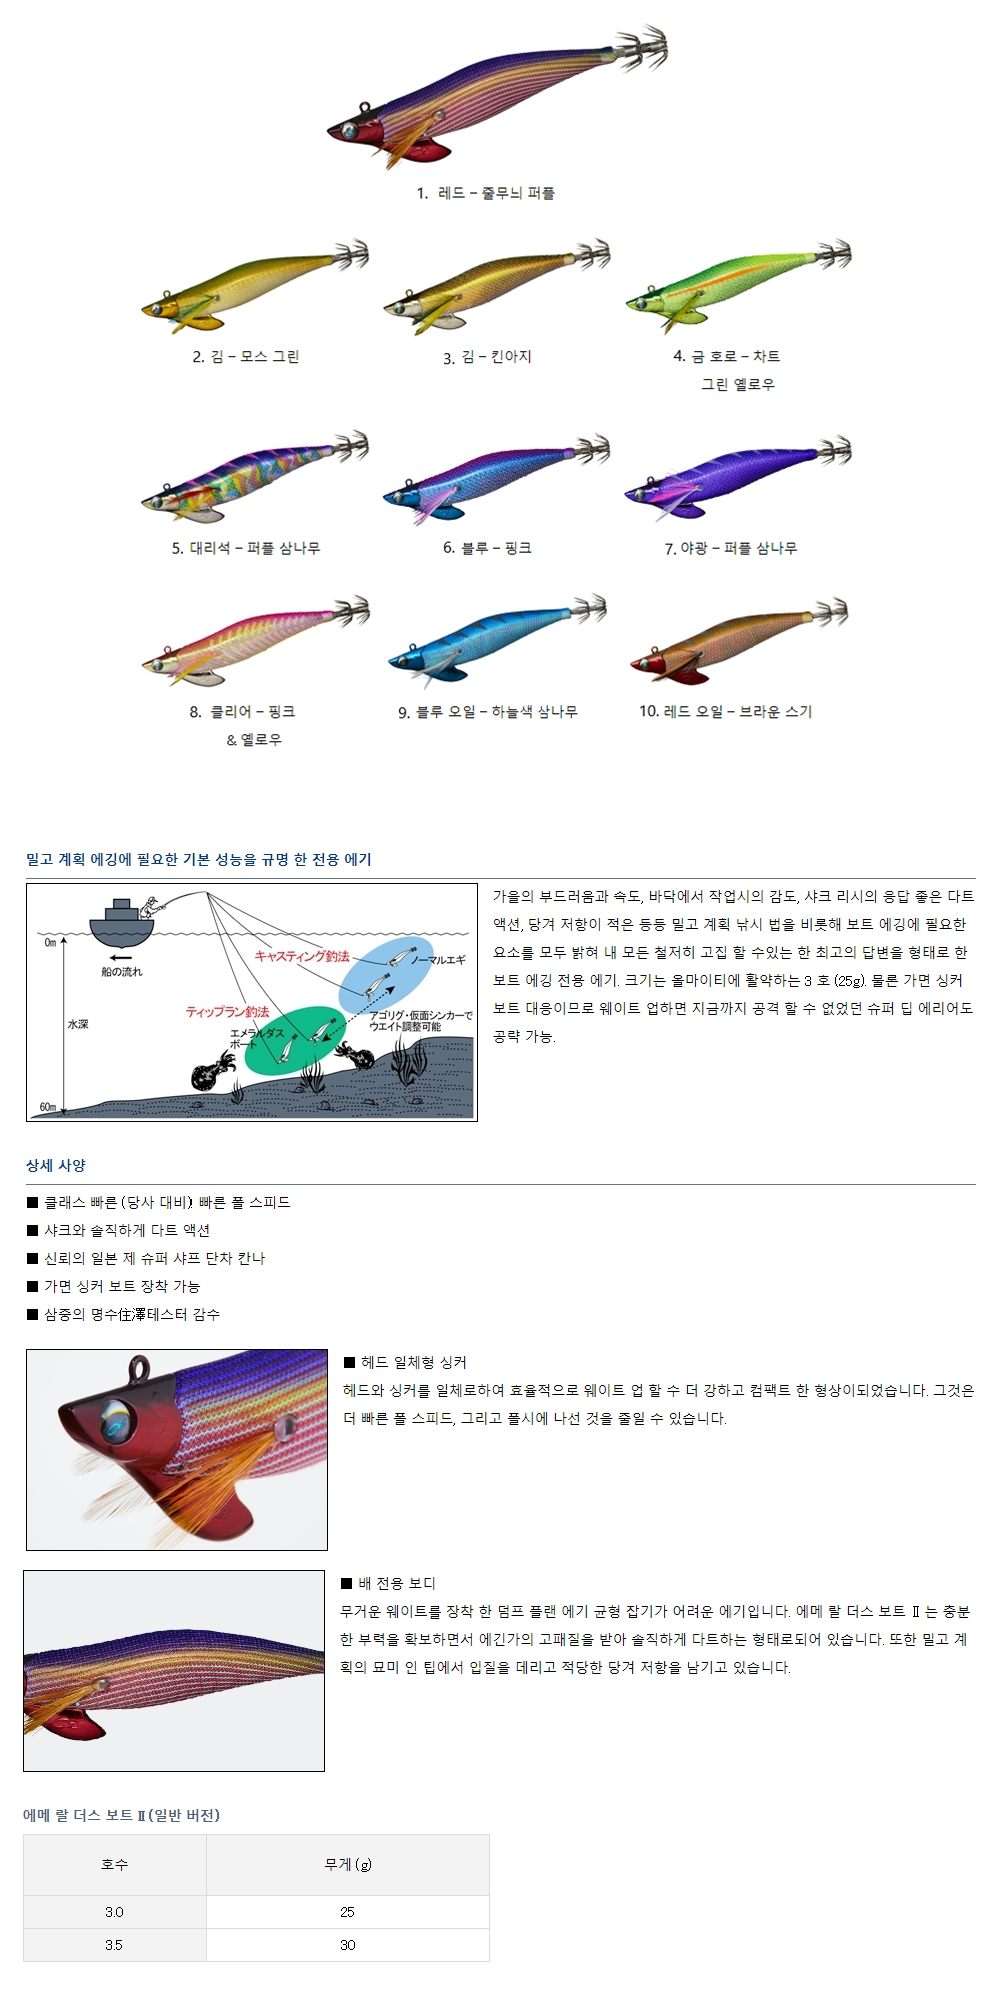 fb08e6e6efef9ea49c106bfabf4e4e0d_1535958685_12.jpg